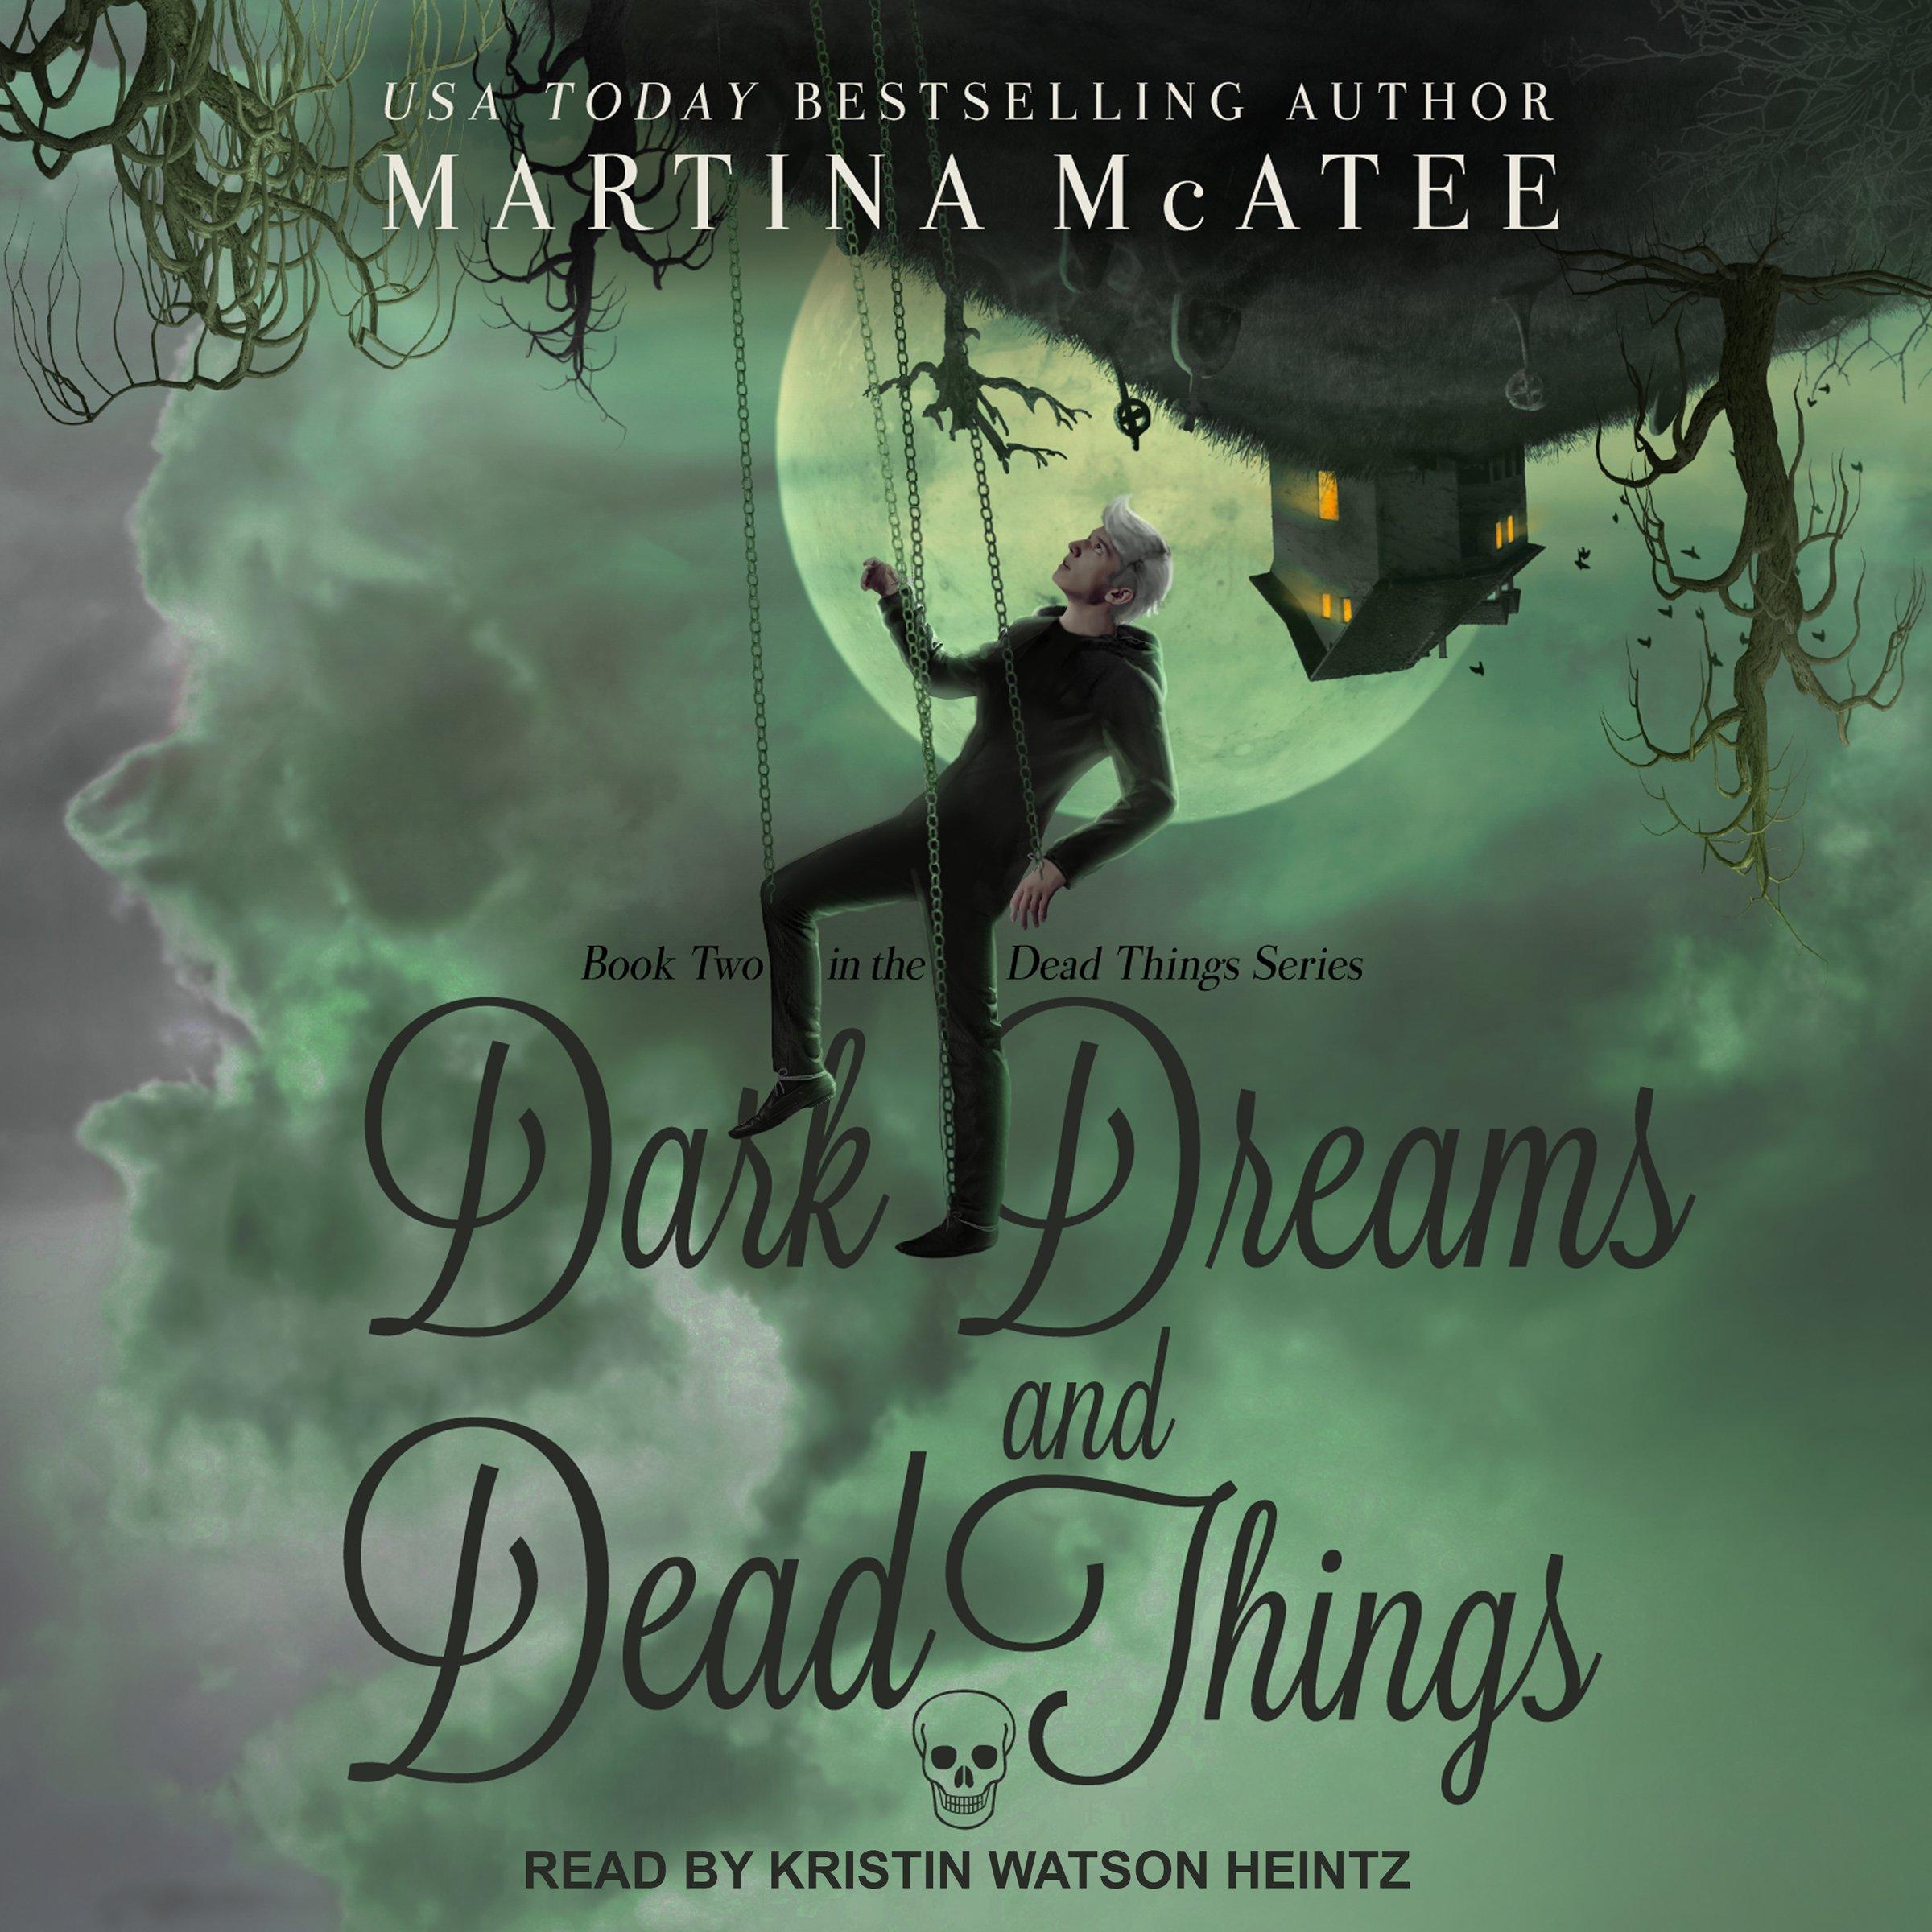 Dark Dreams and Dead Things: Dead Things Series, Book 2 by Tantor Audio (Image #1)